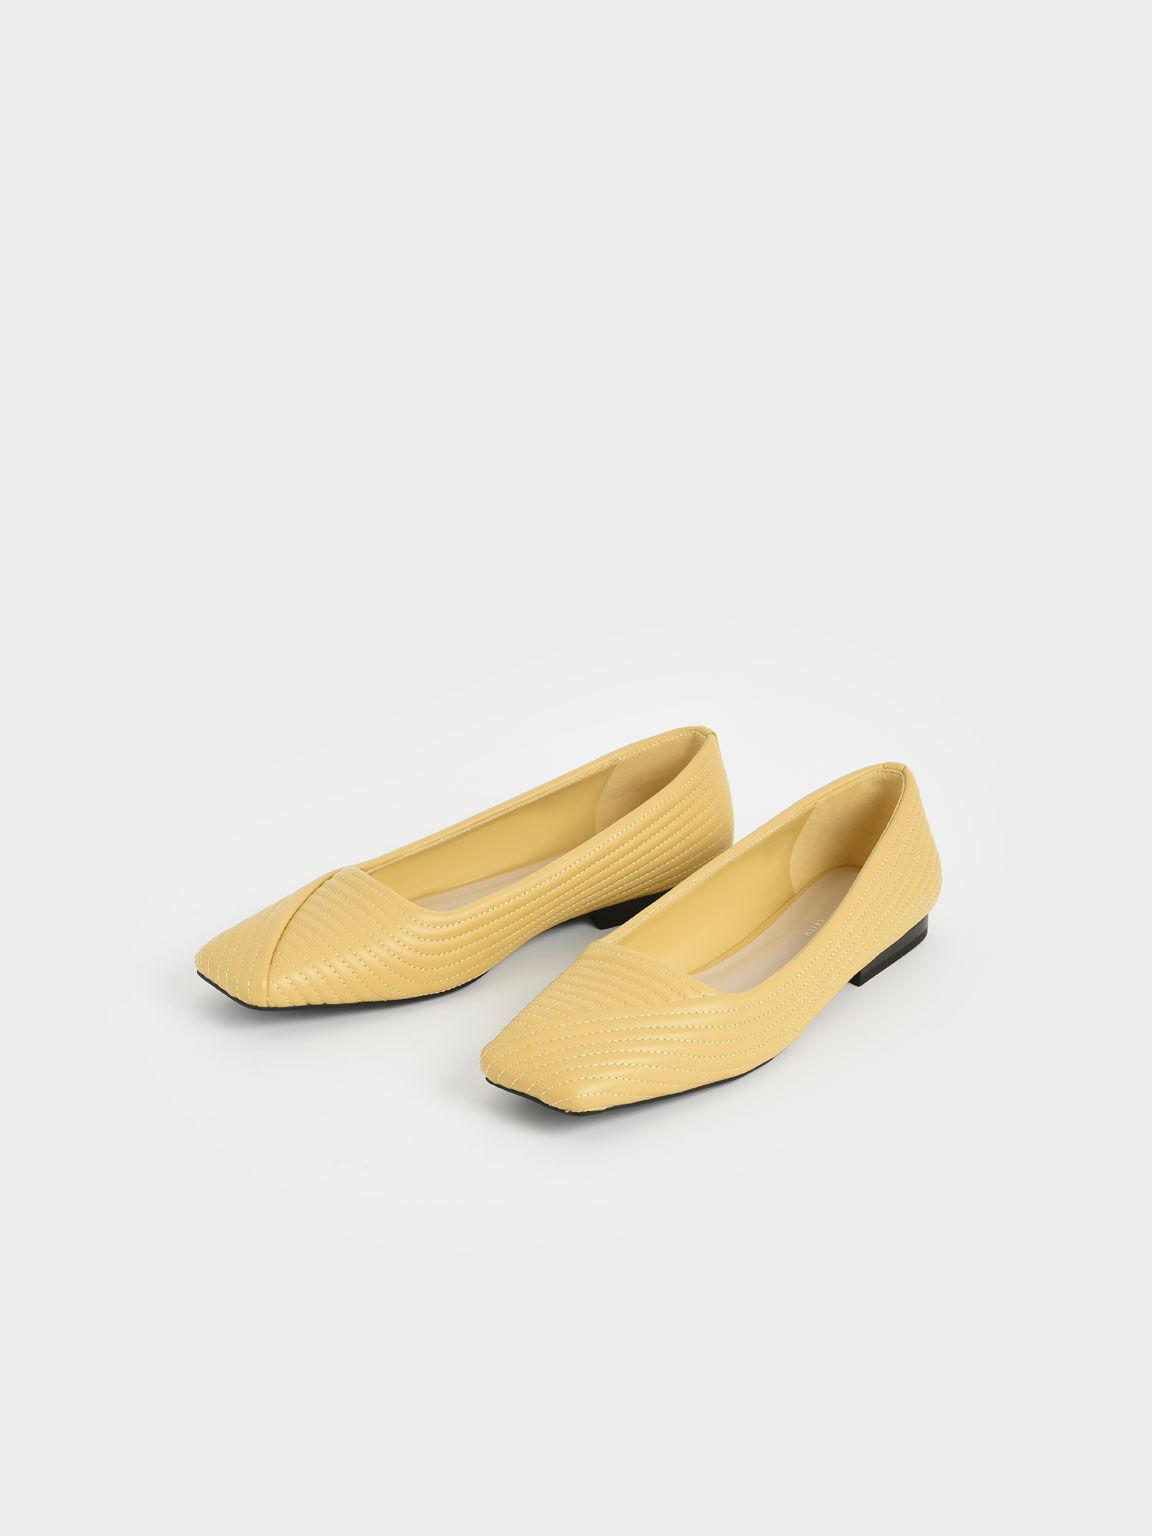 Stitch-Trim Square Toe Ballerina Flats, Yellow, hi-res